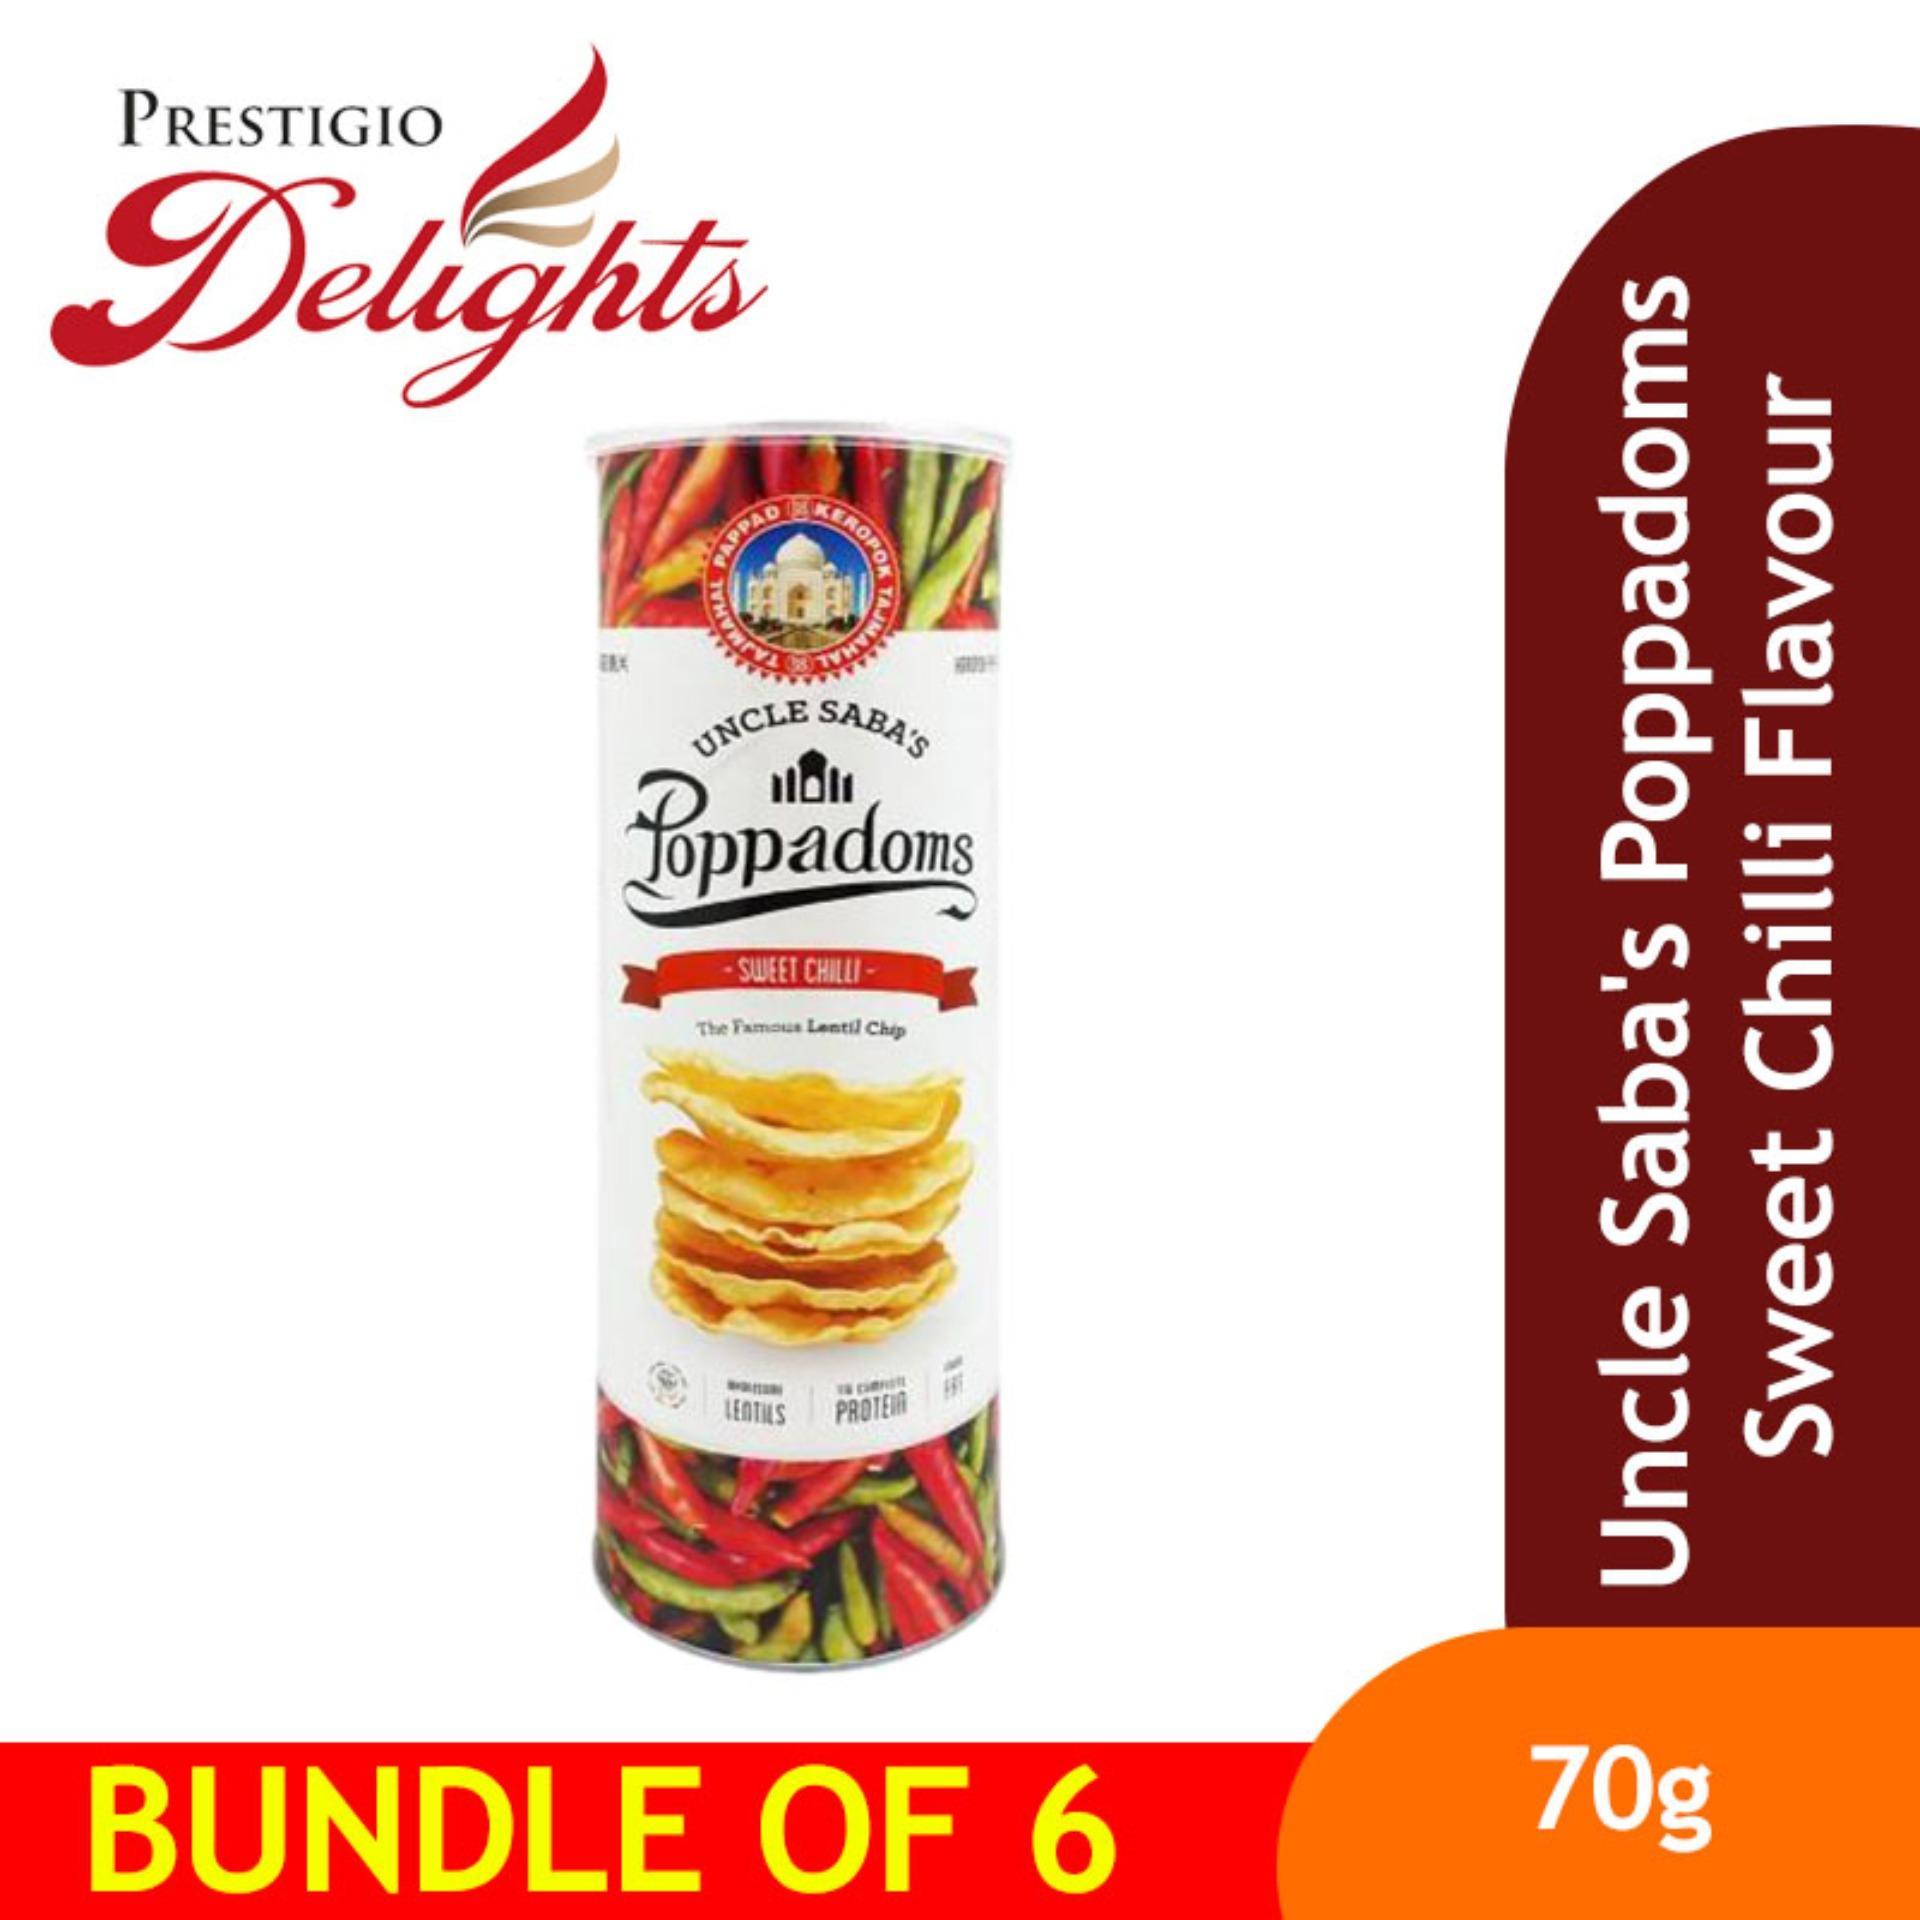 Uncle Sabas Poppadoms Sweet Chilli Flavour Bundle Of 6 By Prestigio Delights.